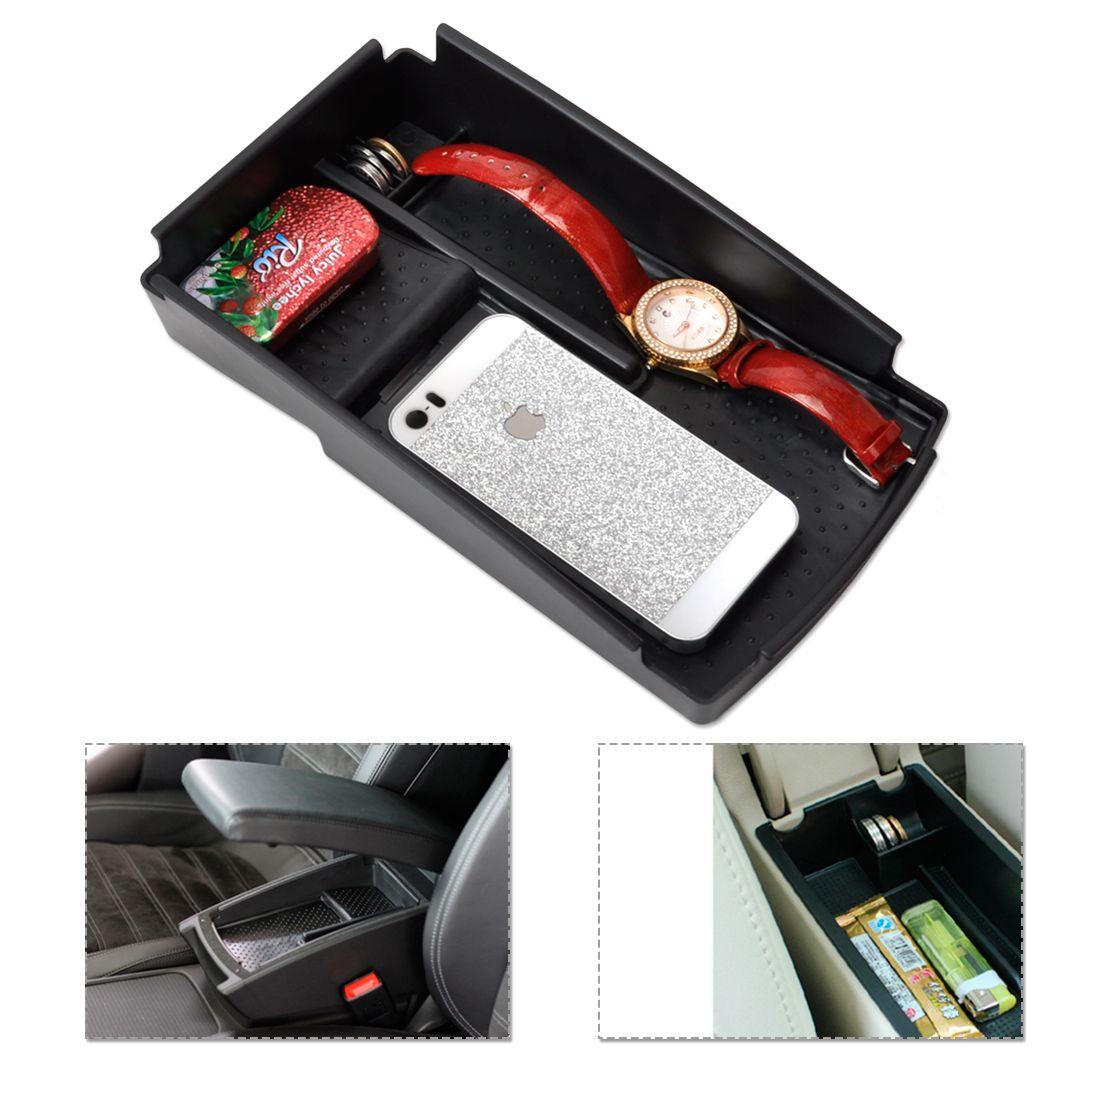 DWCX 1pc ABS Plastics Car Glove Box Armrest Box Secondary